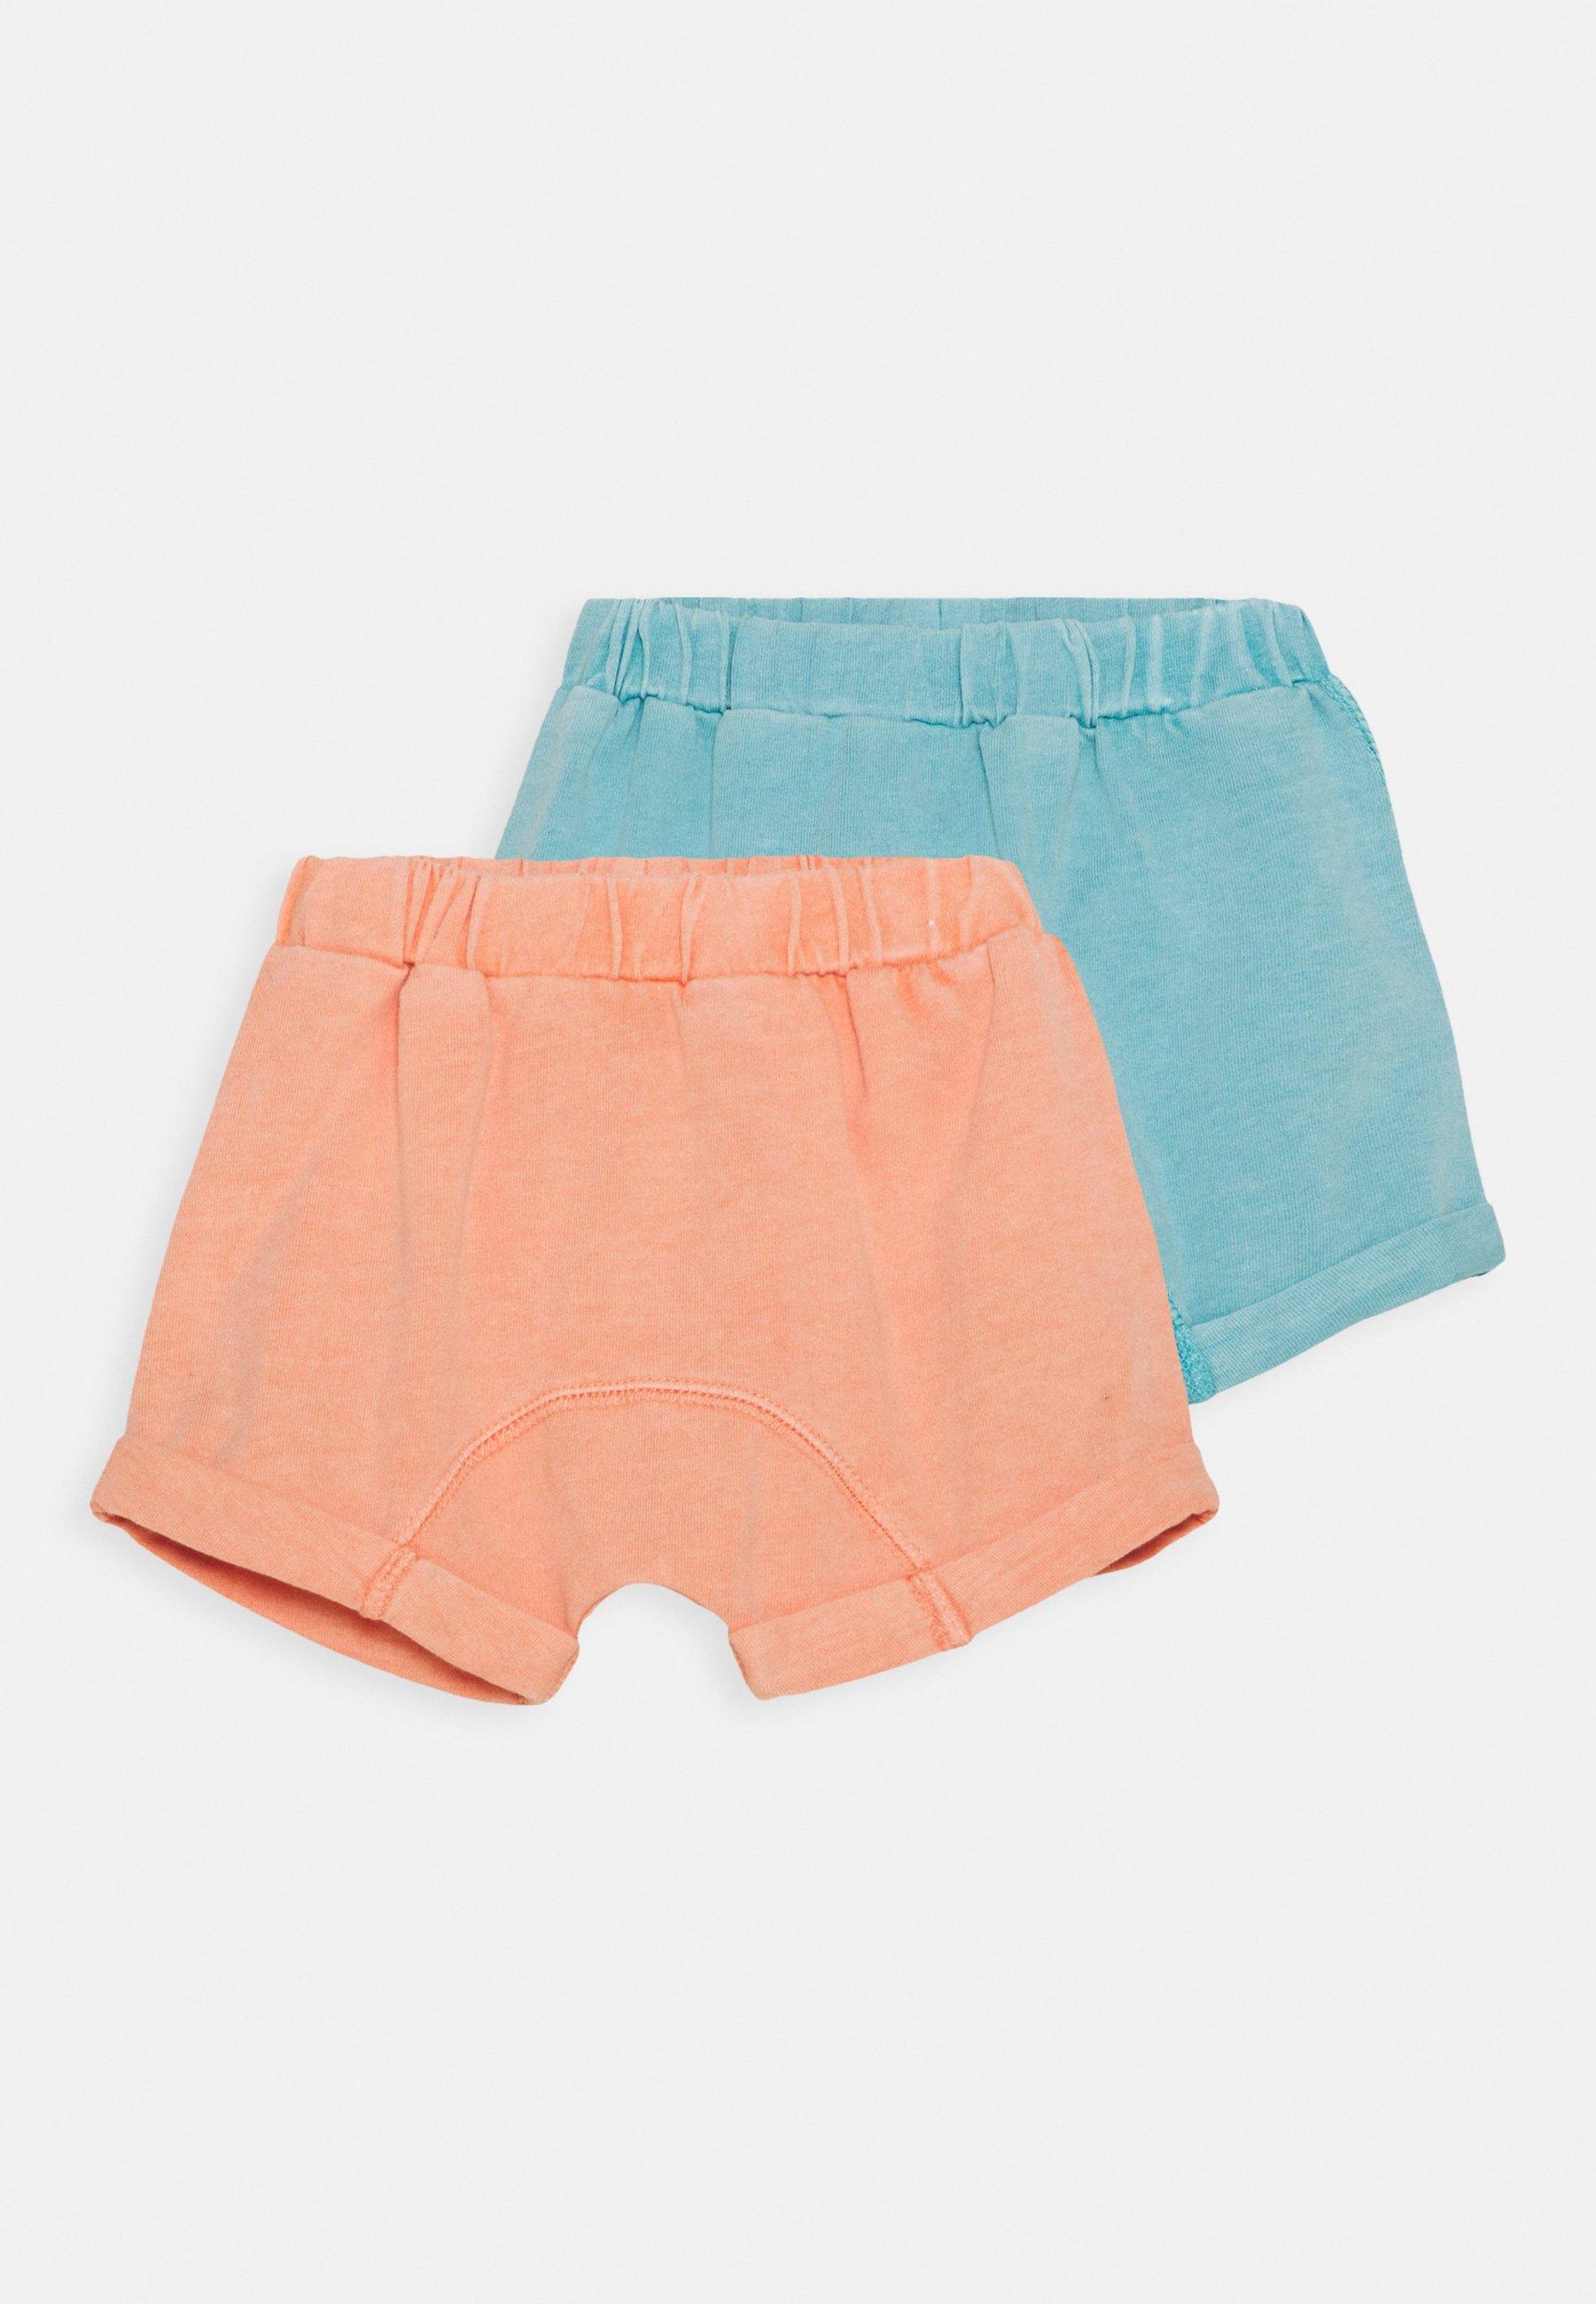 Kids SHELBY UNISEX 2 PACK - Shorts